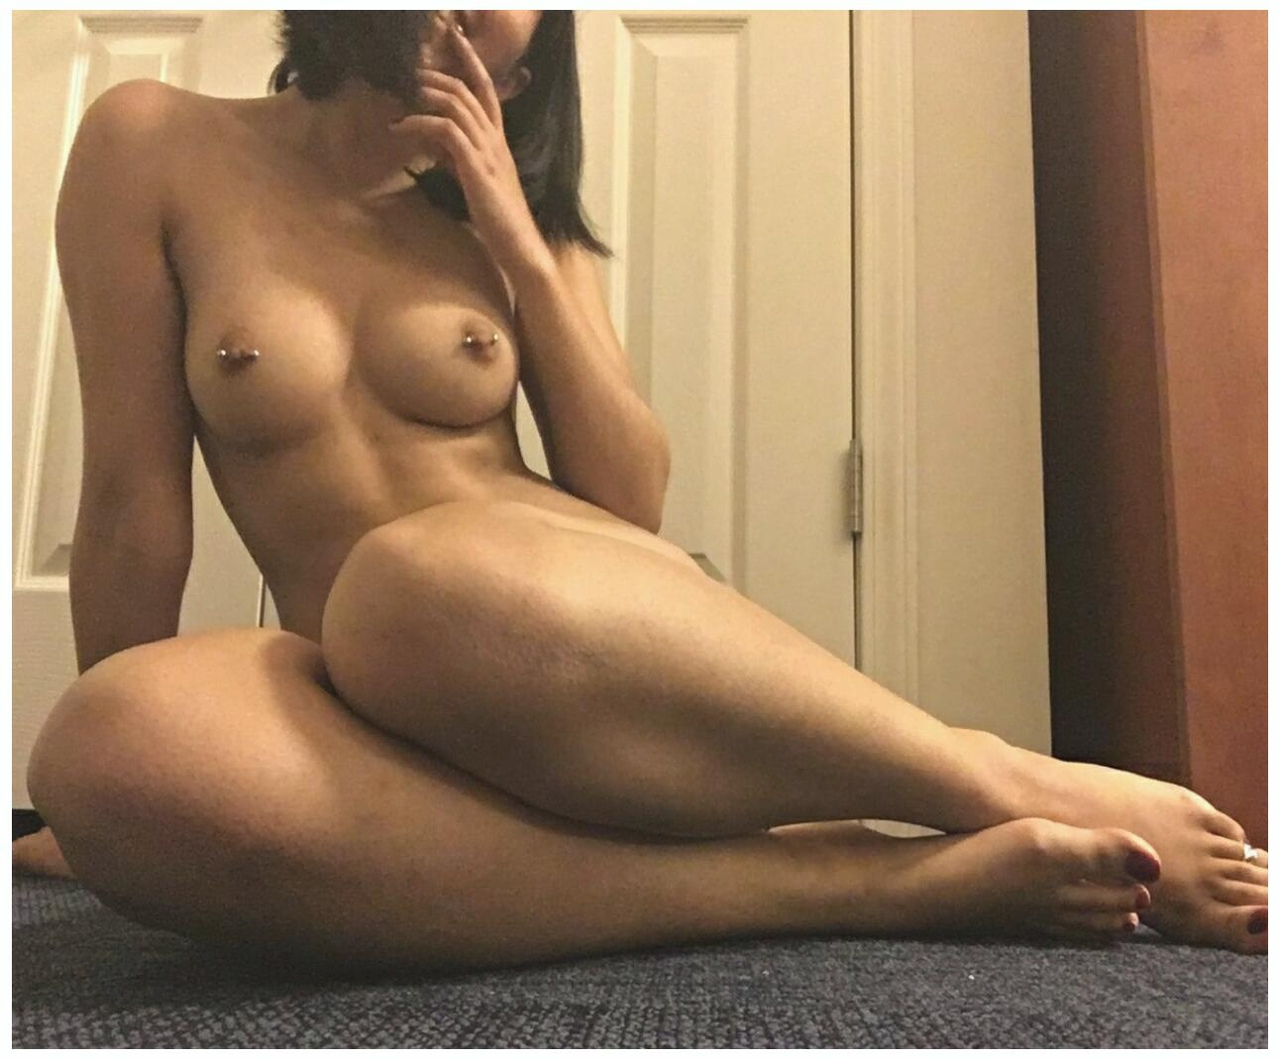 Insane toon Futanari SciFi porn videos